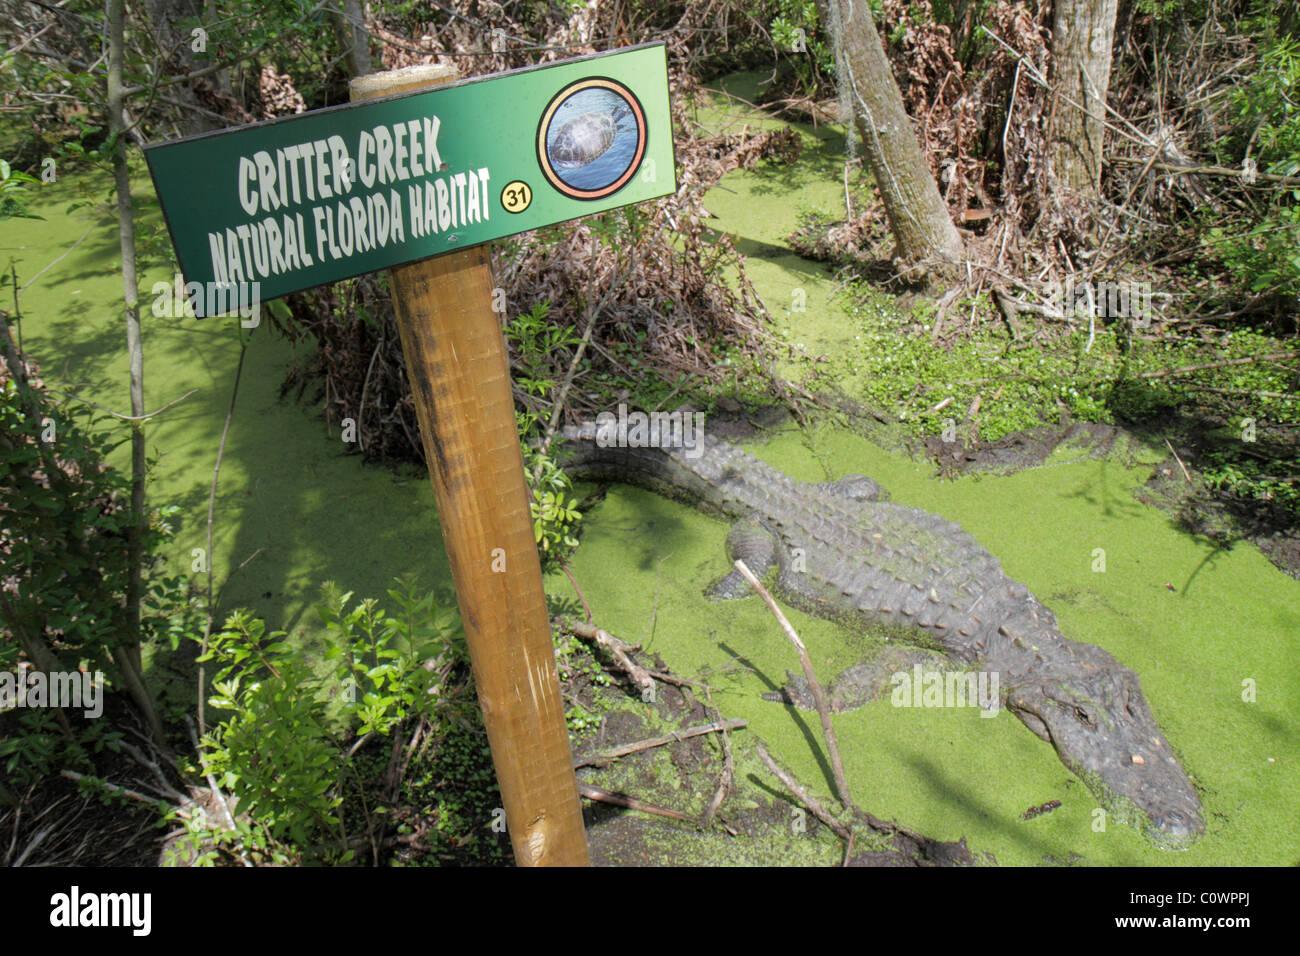 Orlando Florida Christmas Jungle Adventure Nature Park & and Zoo natural habitat sign alligator sunning - Stock Image